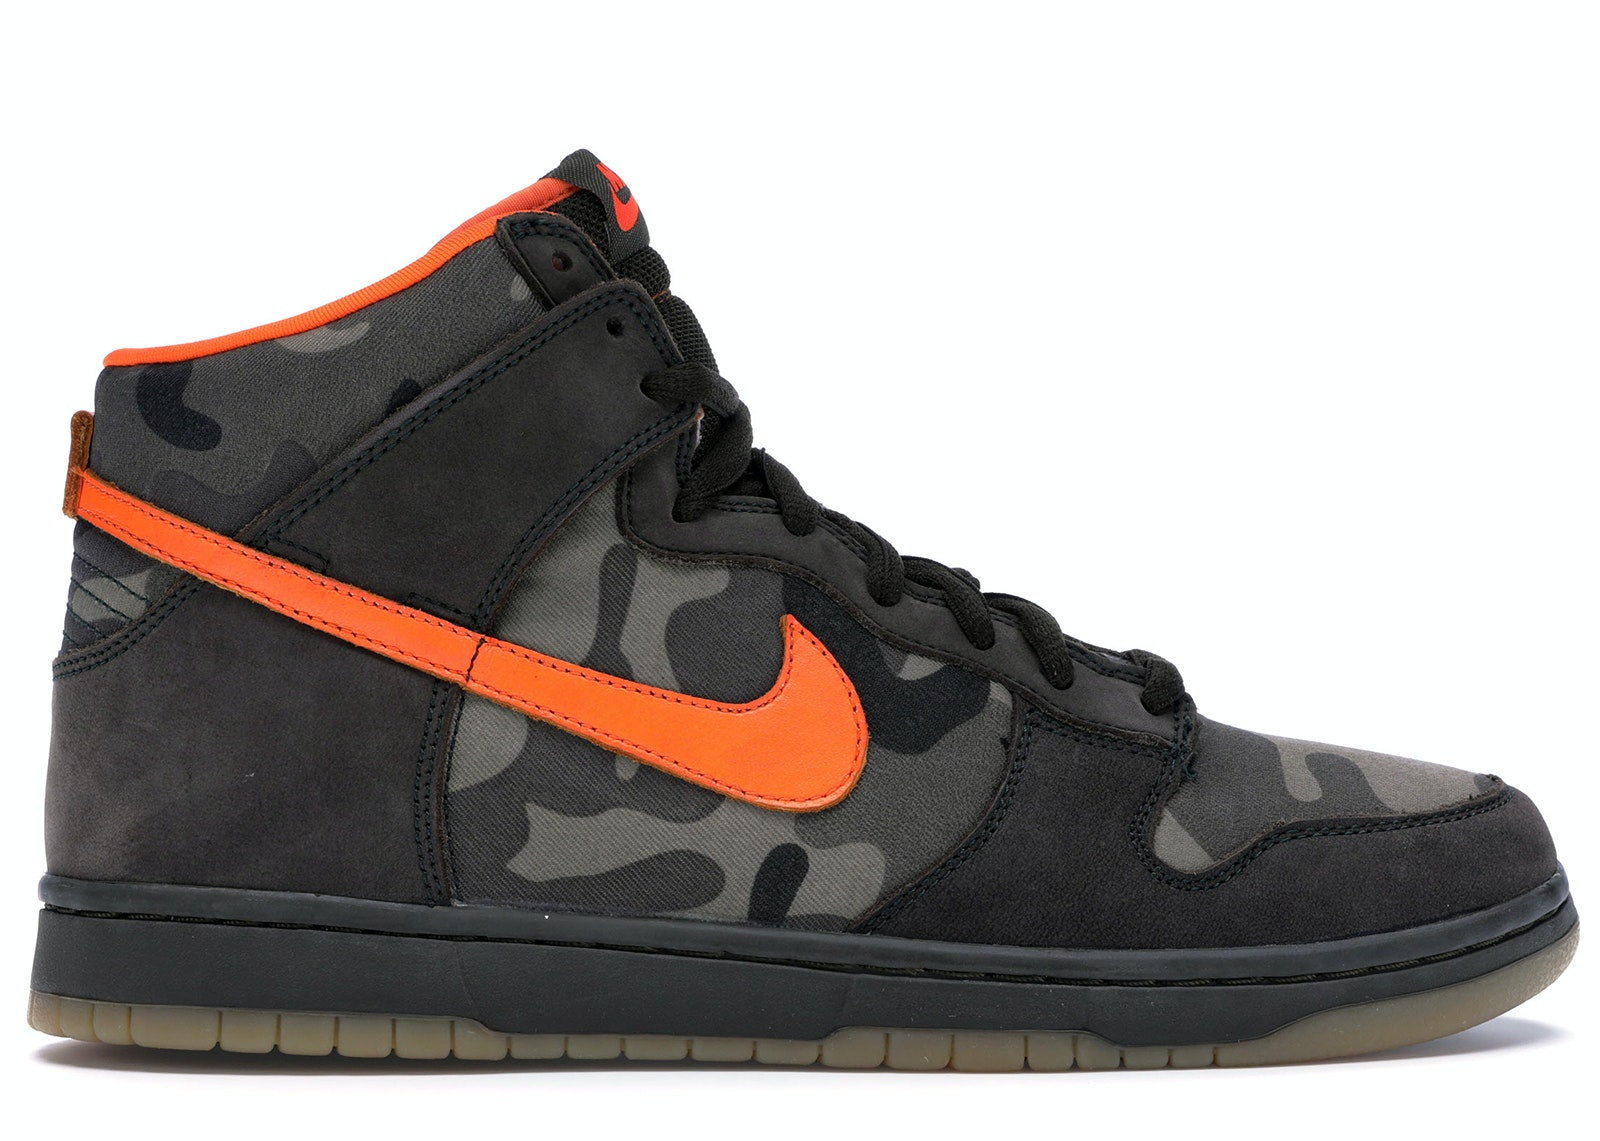 Nike SB Dunk High Brian Anderson Camo